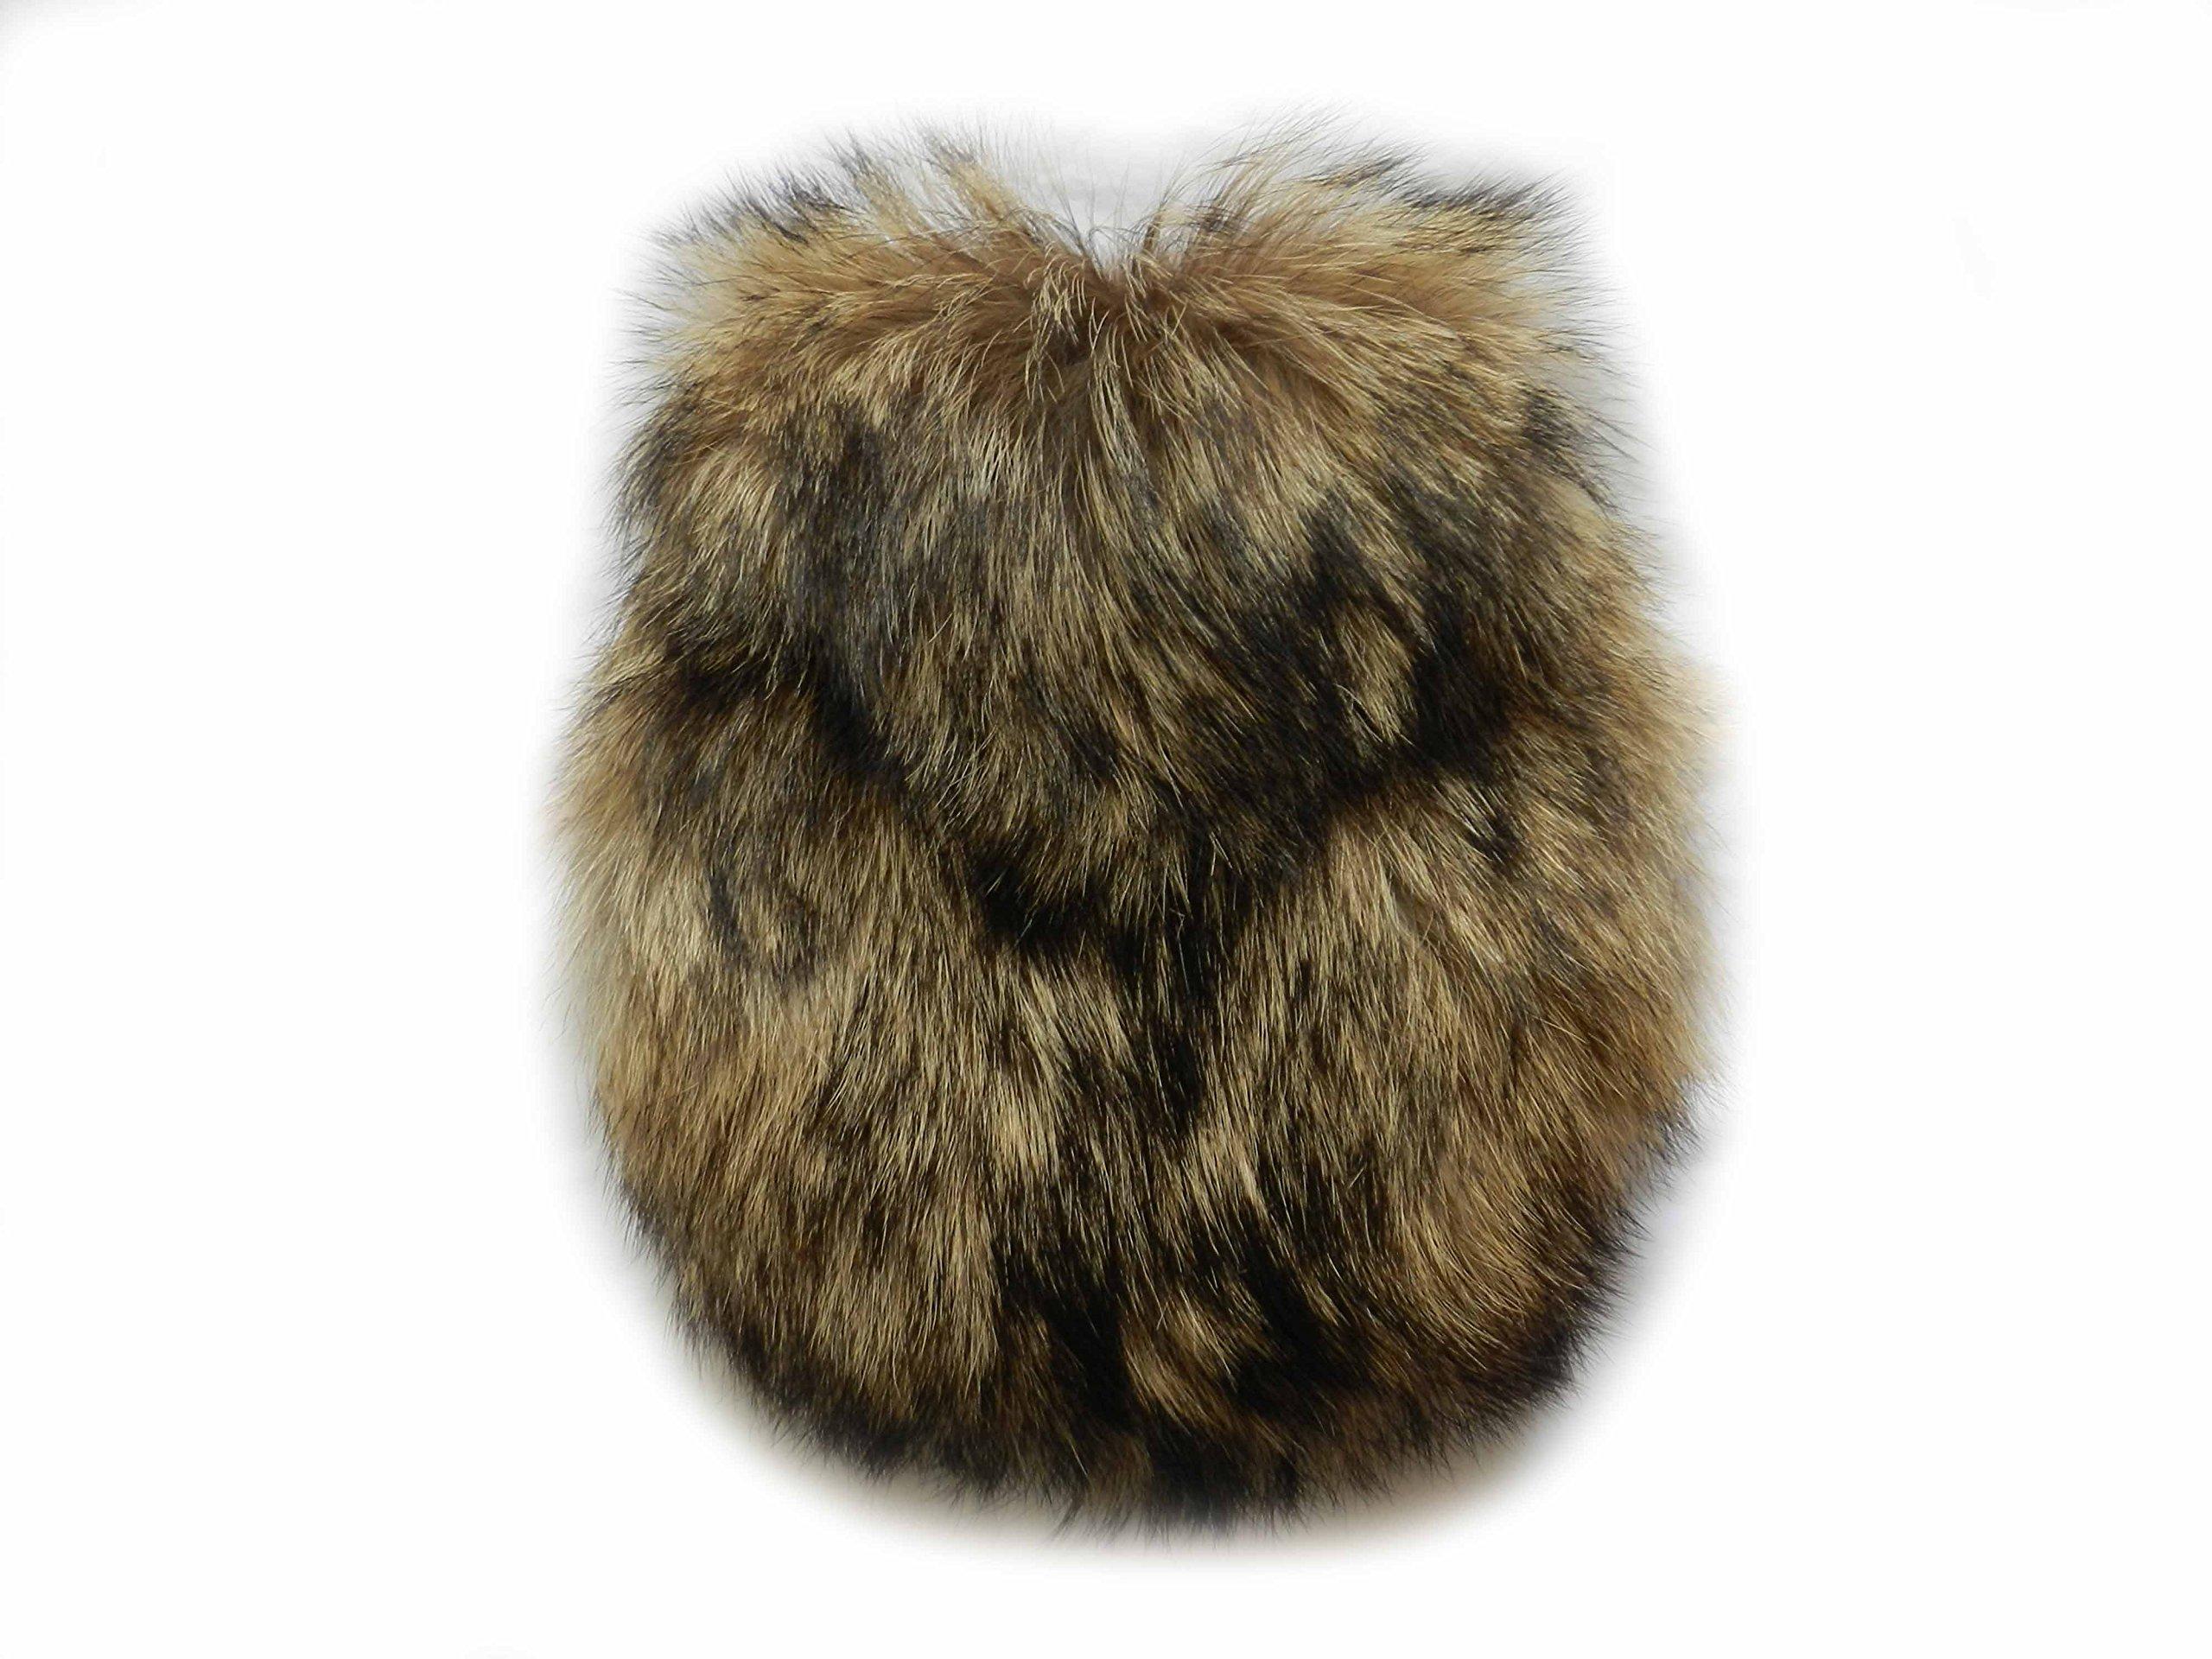 Scottish Kilt Coyote Fur Sporrans - Formal, Full Fur, Semi Formal